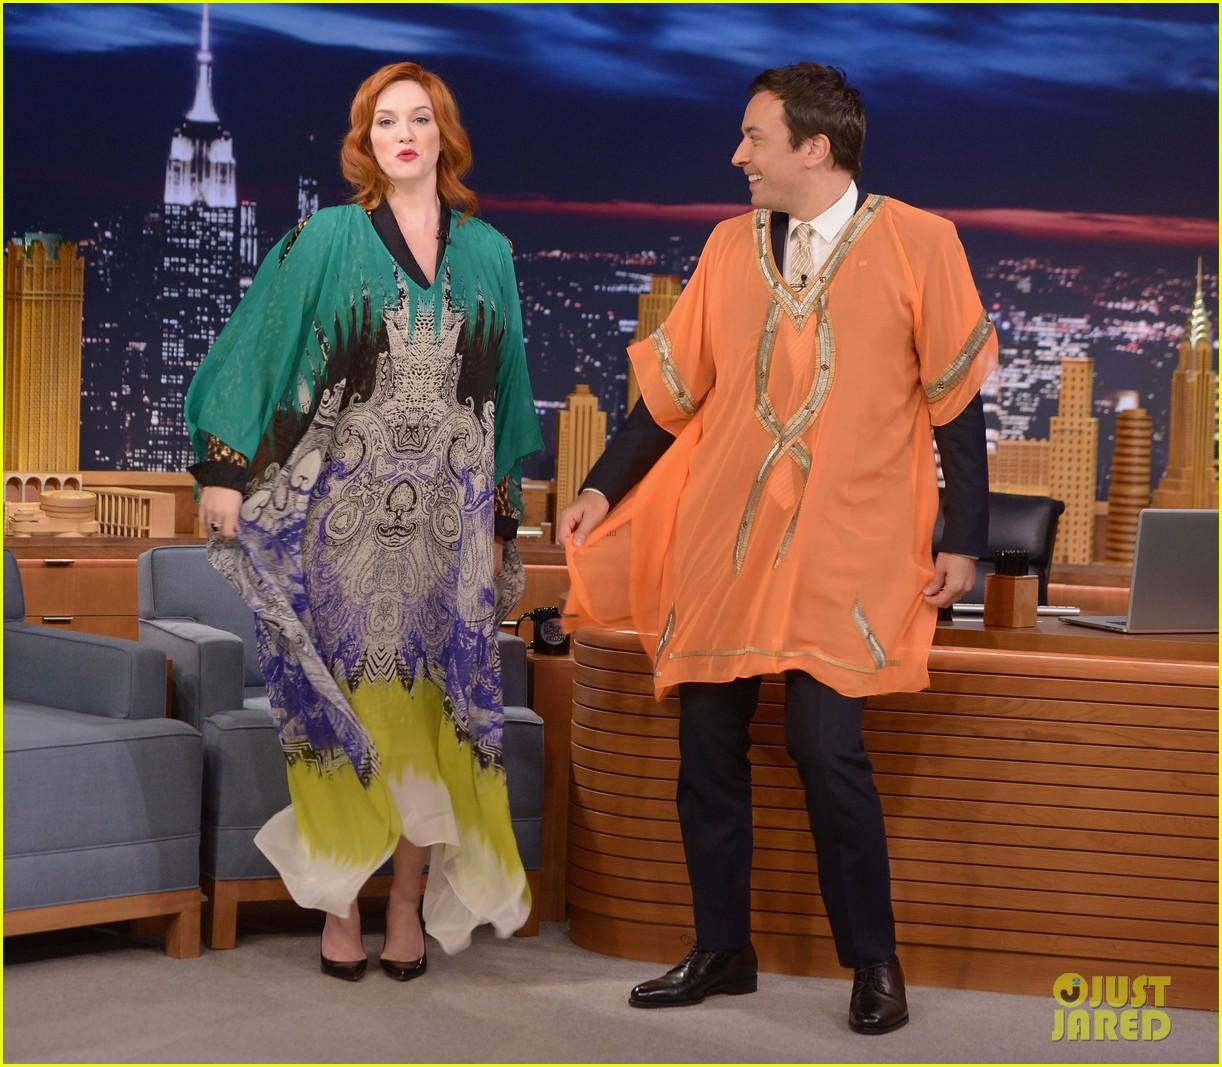 christina hendricks expresses her love for kaftan dresses on tonight show 053096690